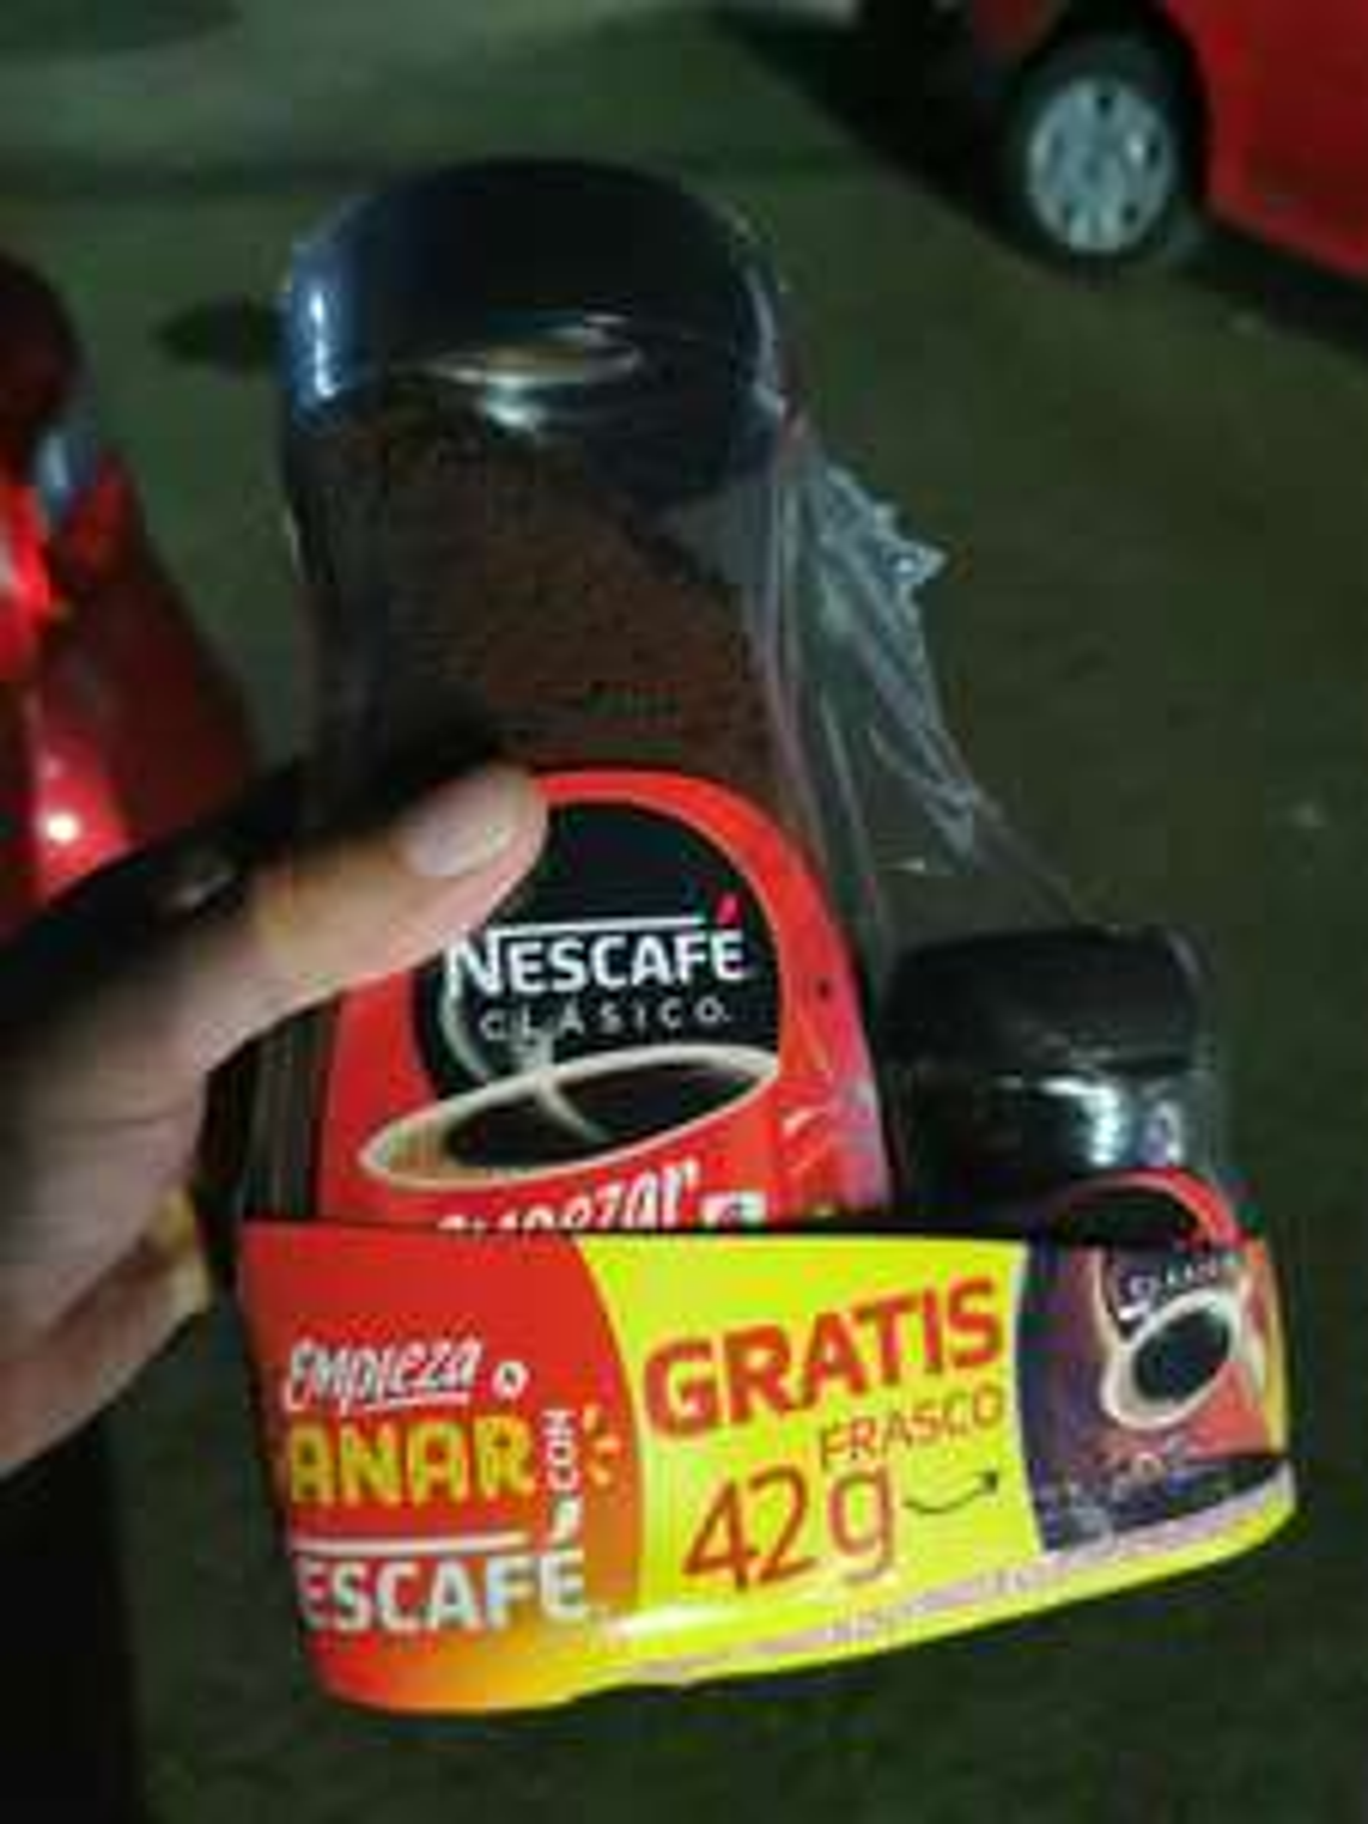 Chedraui Tapachula Sur. Nescafe. 267 gramos